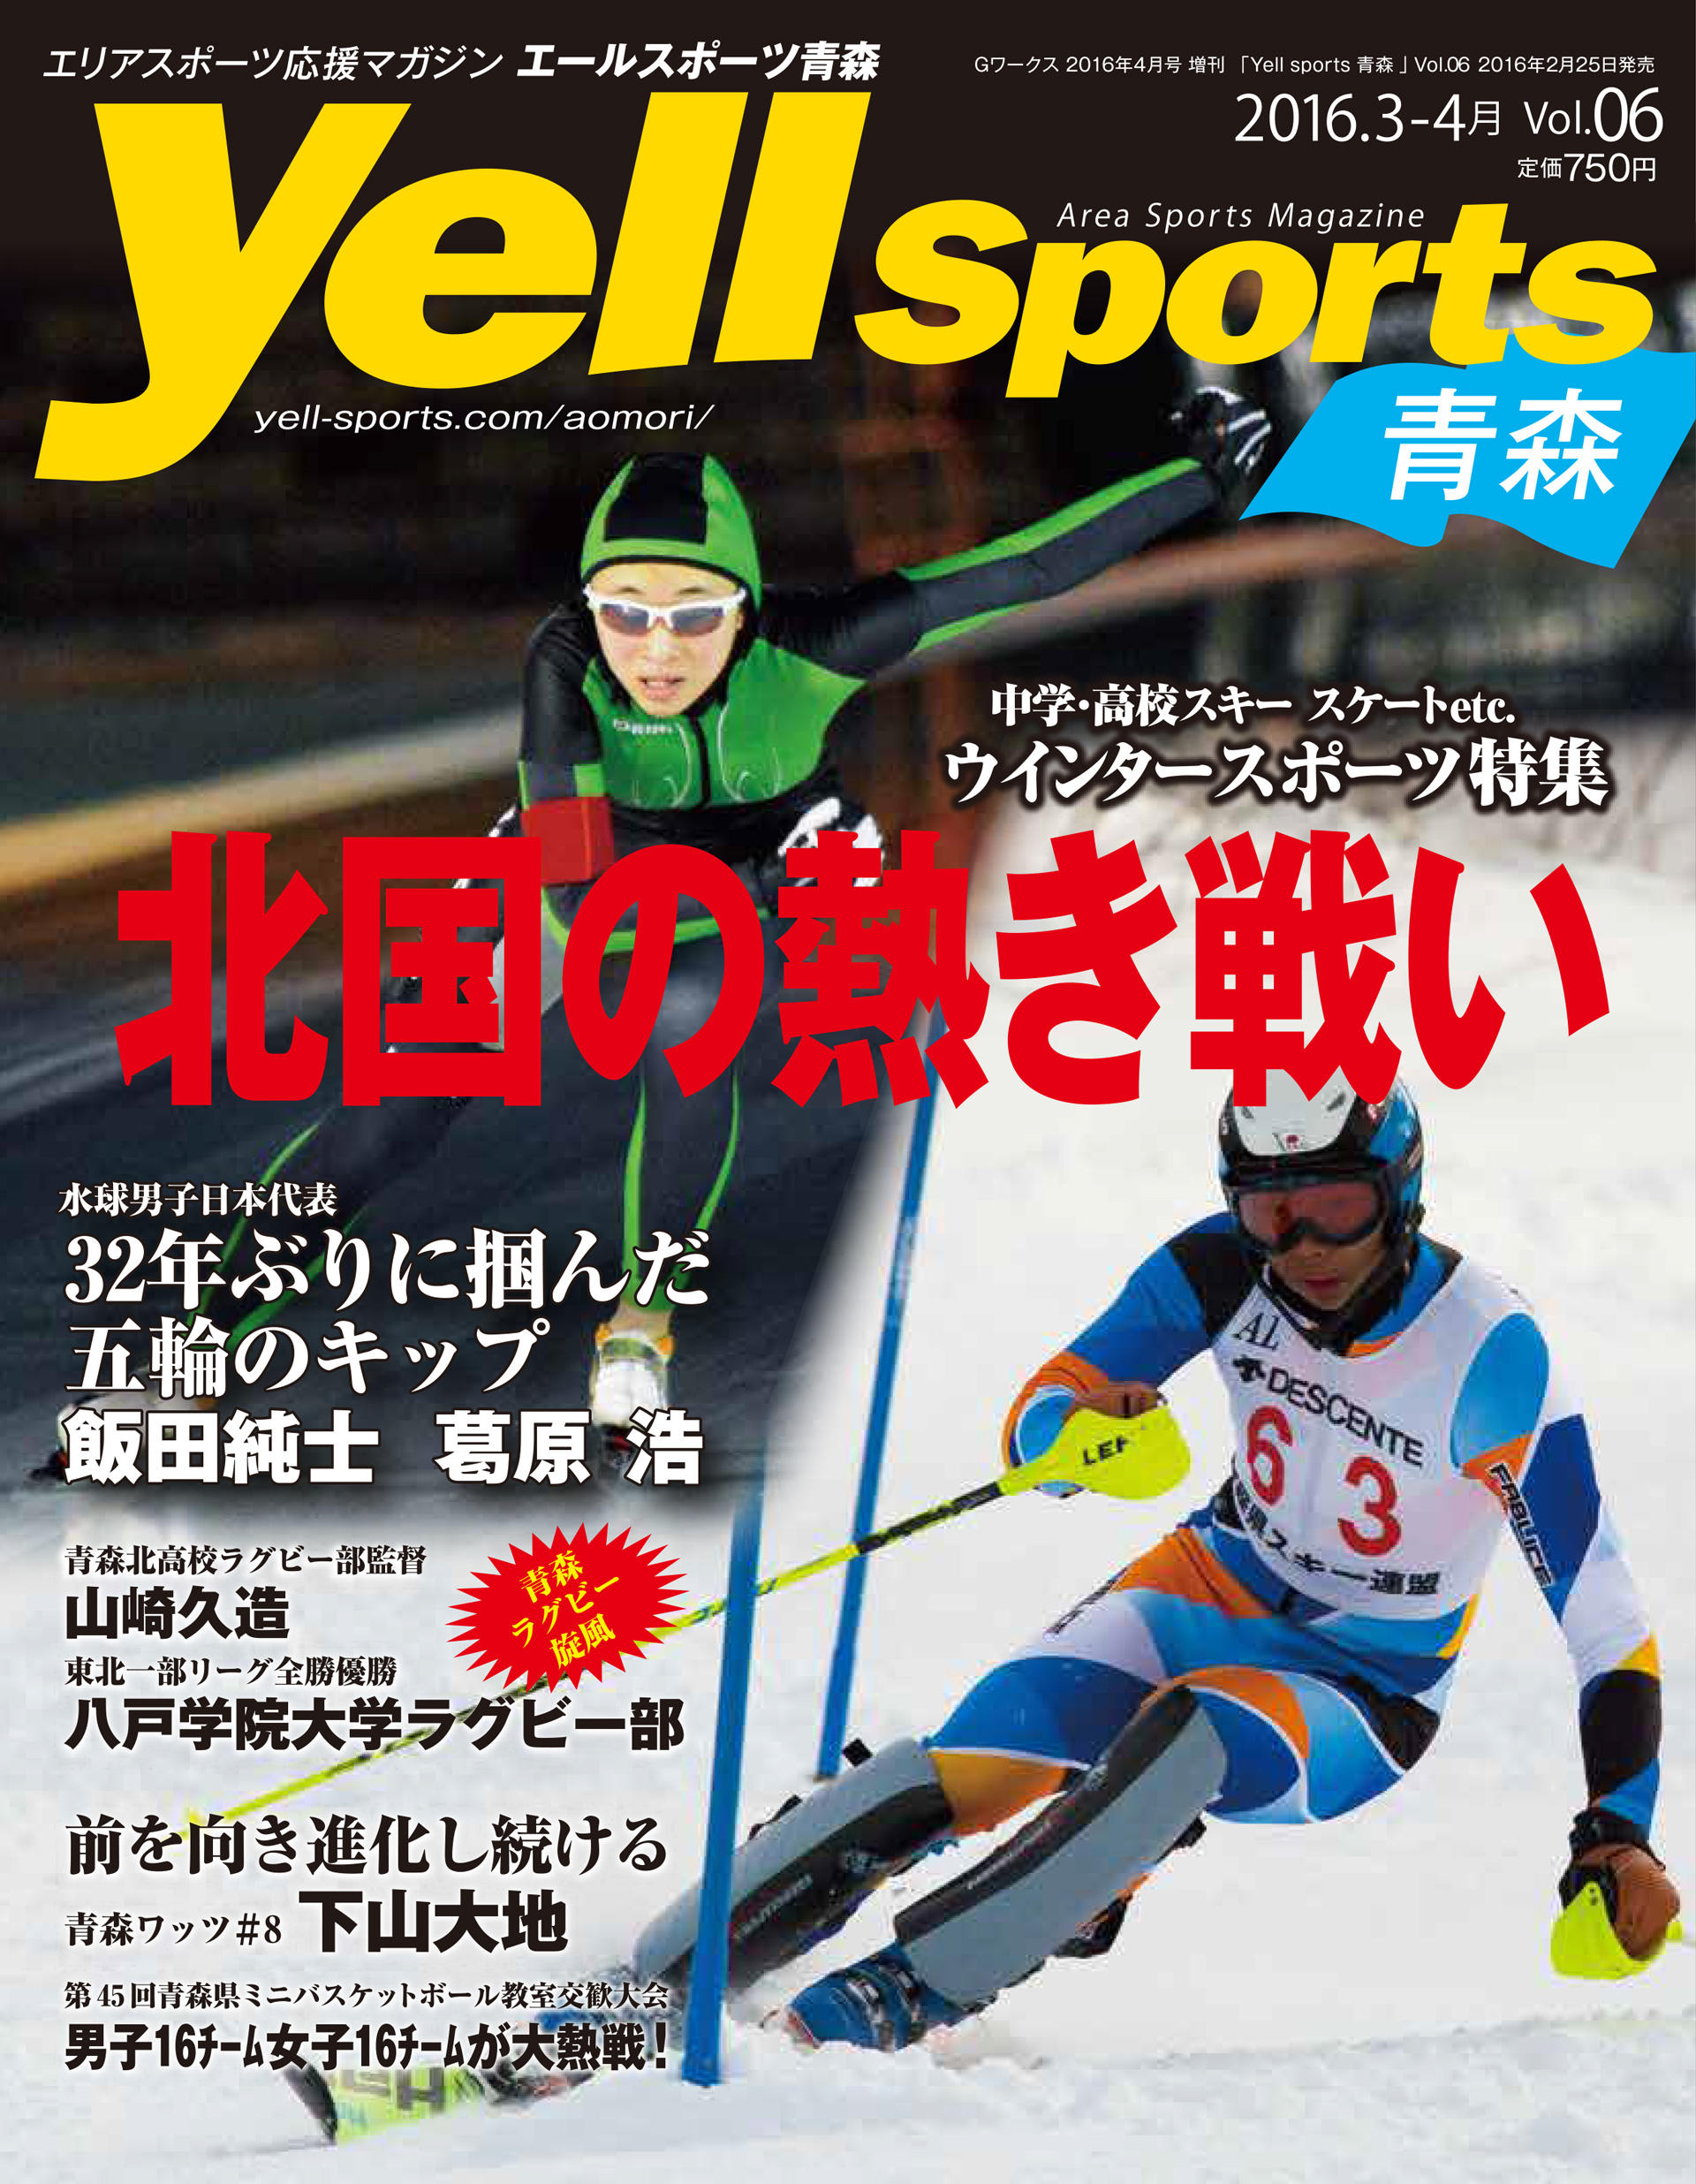 http://yell-sports.com/aomori/article/2016/ysa06_H1.jpg